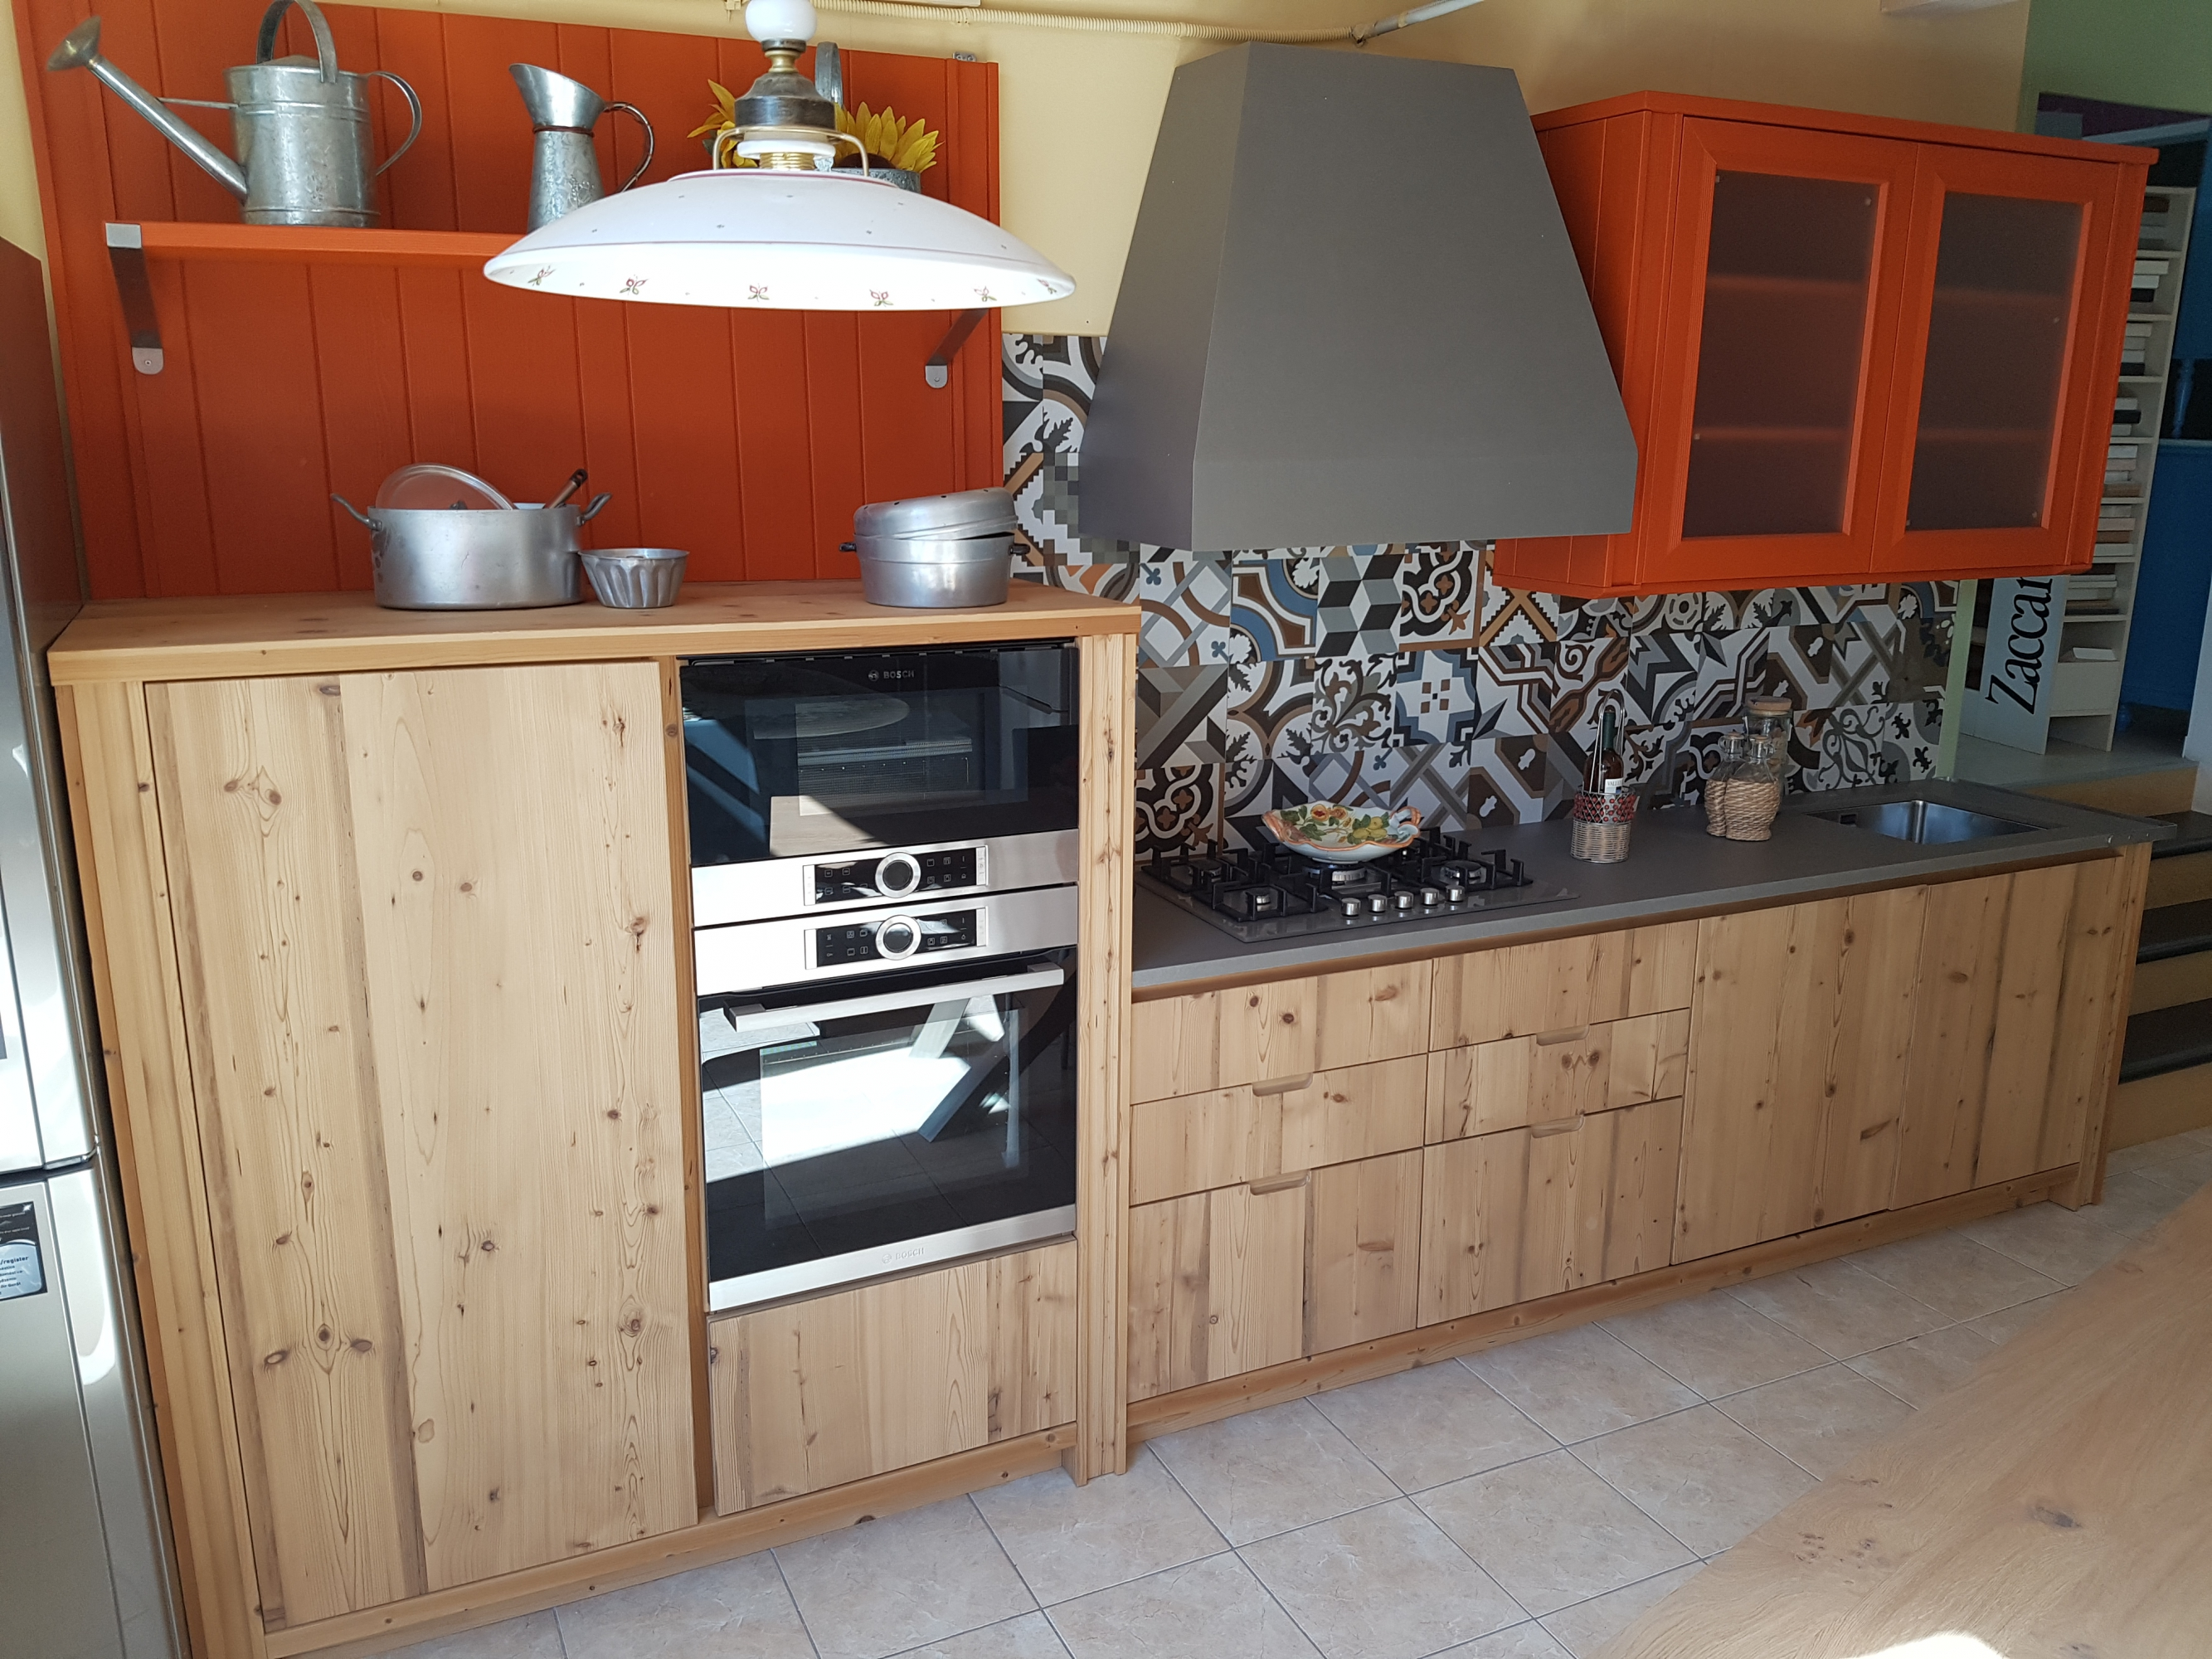 cucina vintage cucine arredamenti cucine siciliane